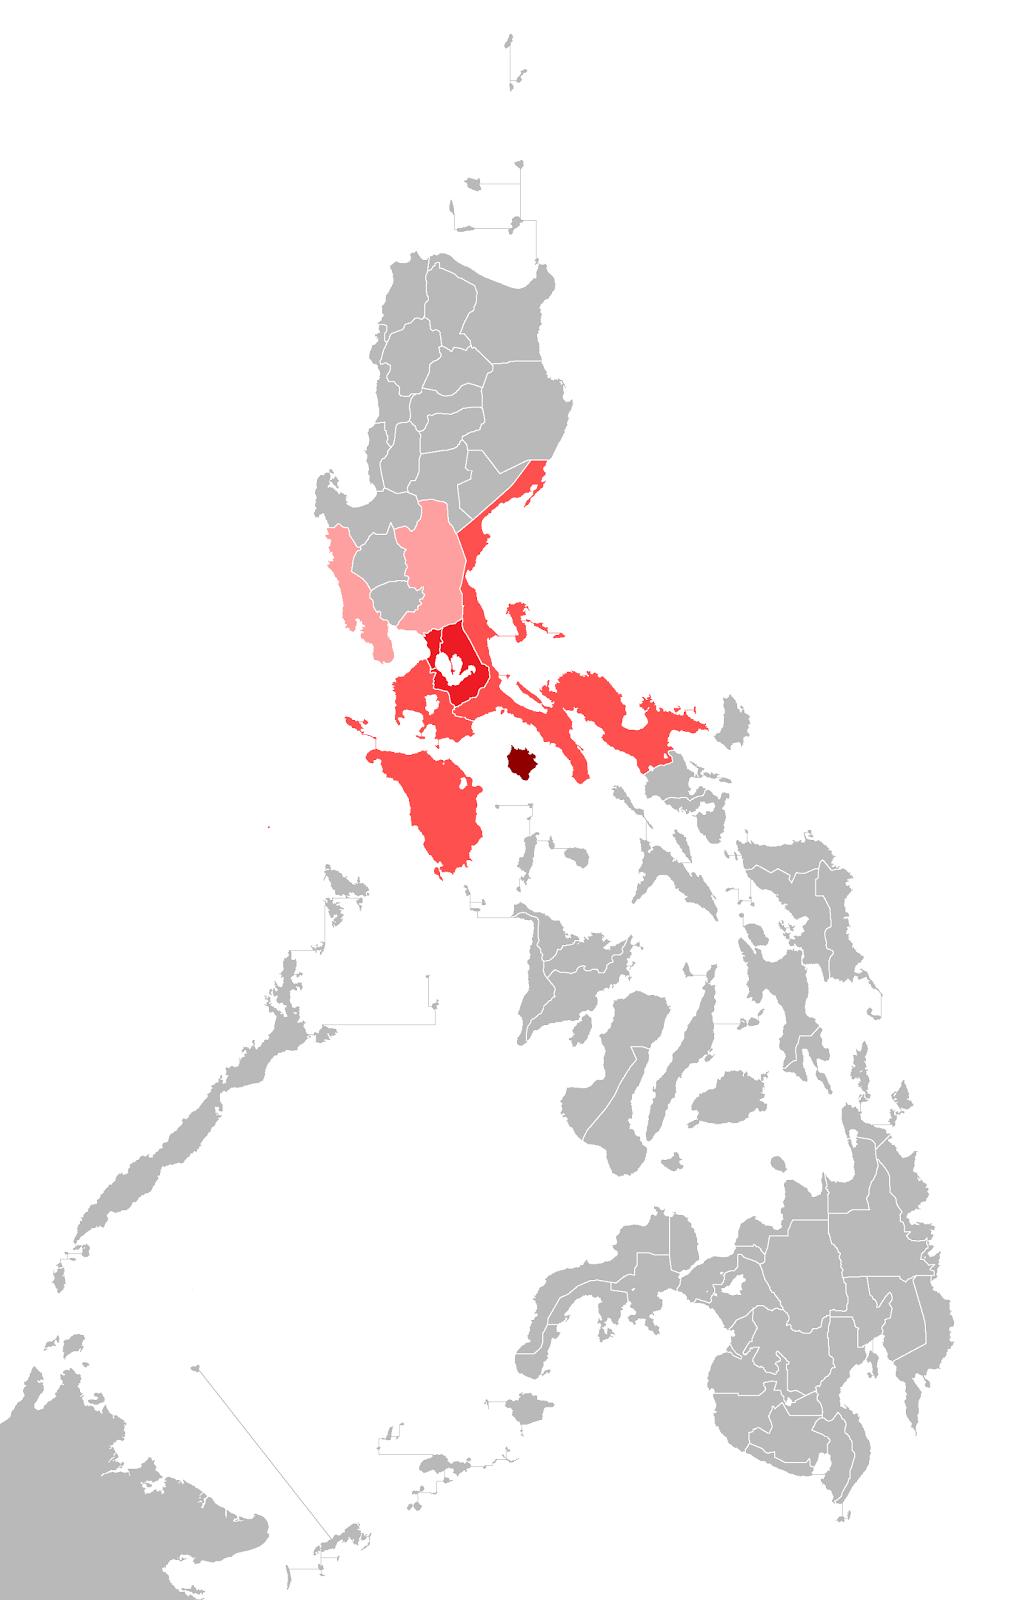 Philippine Review: Tagalog Origin